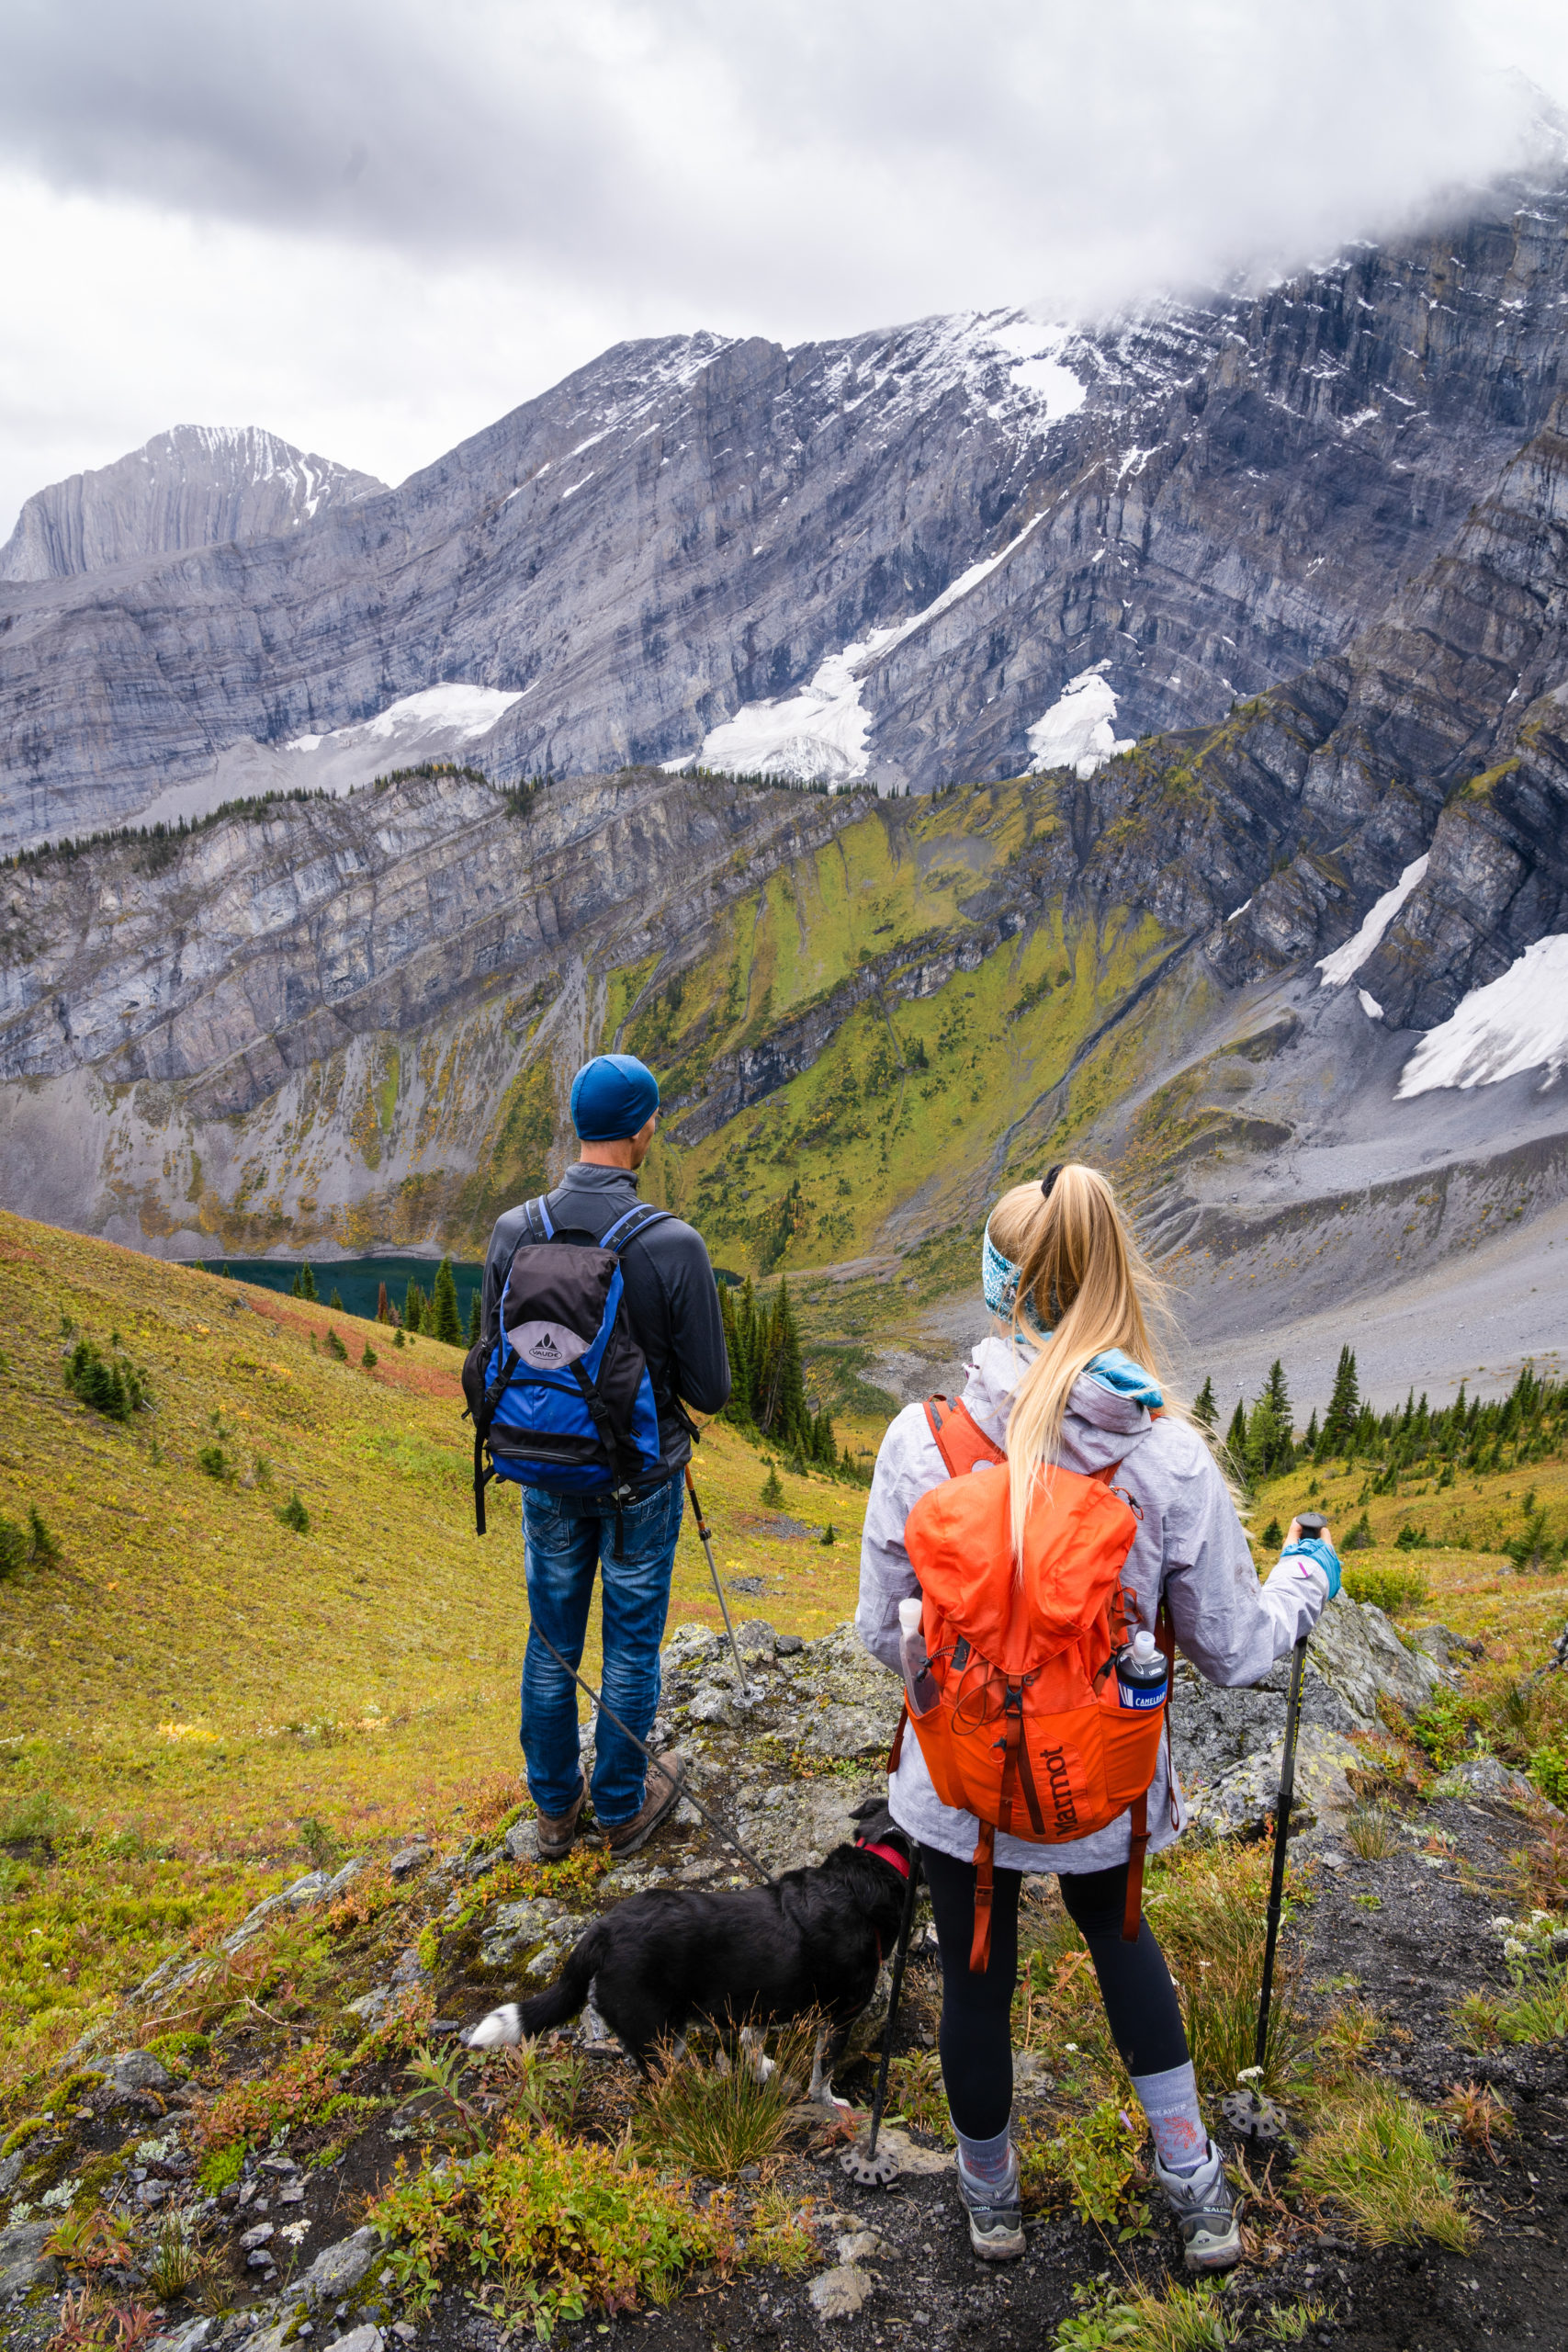 Randonnée_canada_banff_alberta_trekking_montagnes